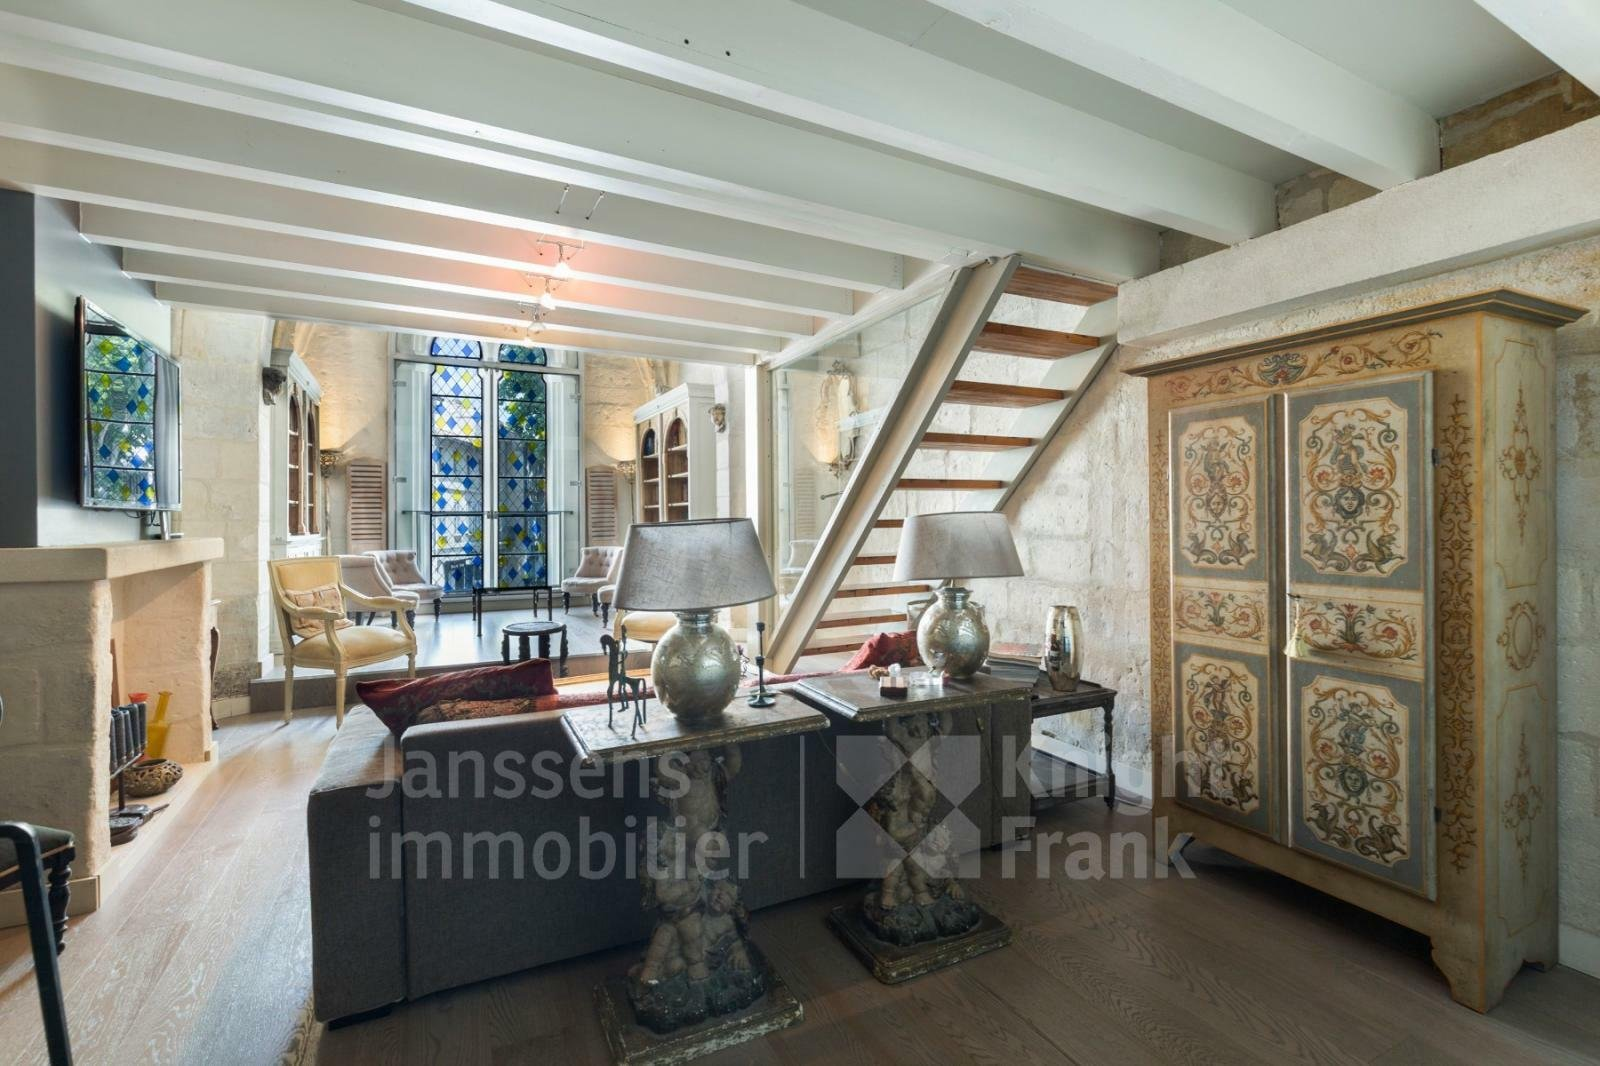 Villa in Avignon, Provence-Alpes-Côte d'Azur, France 1 - 11468953